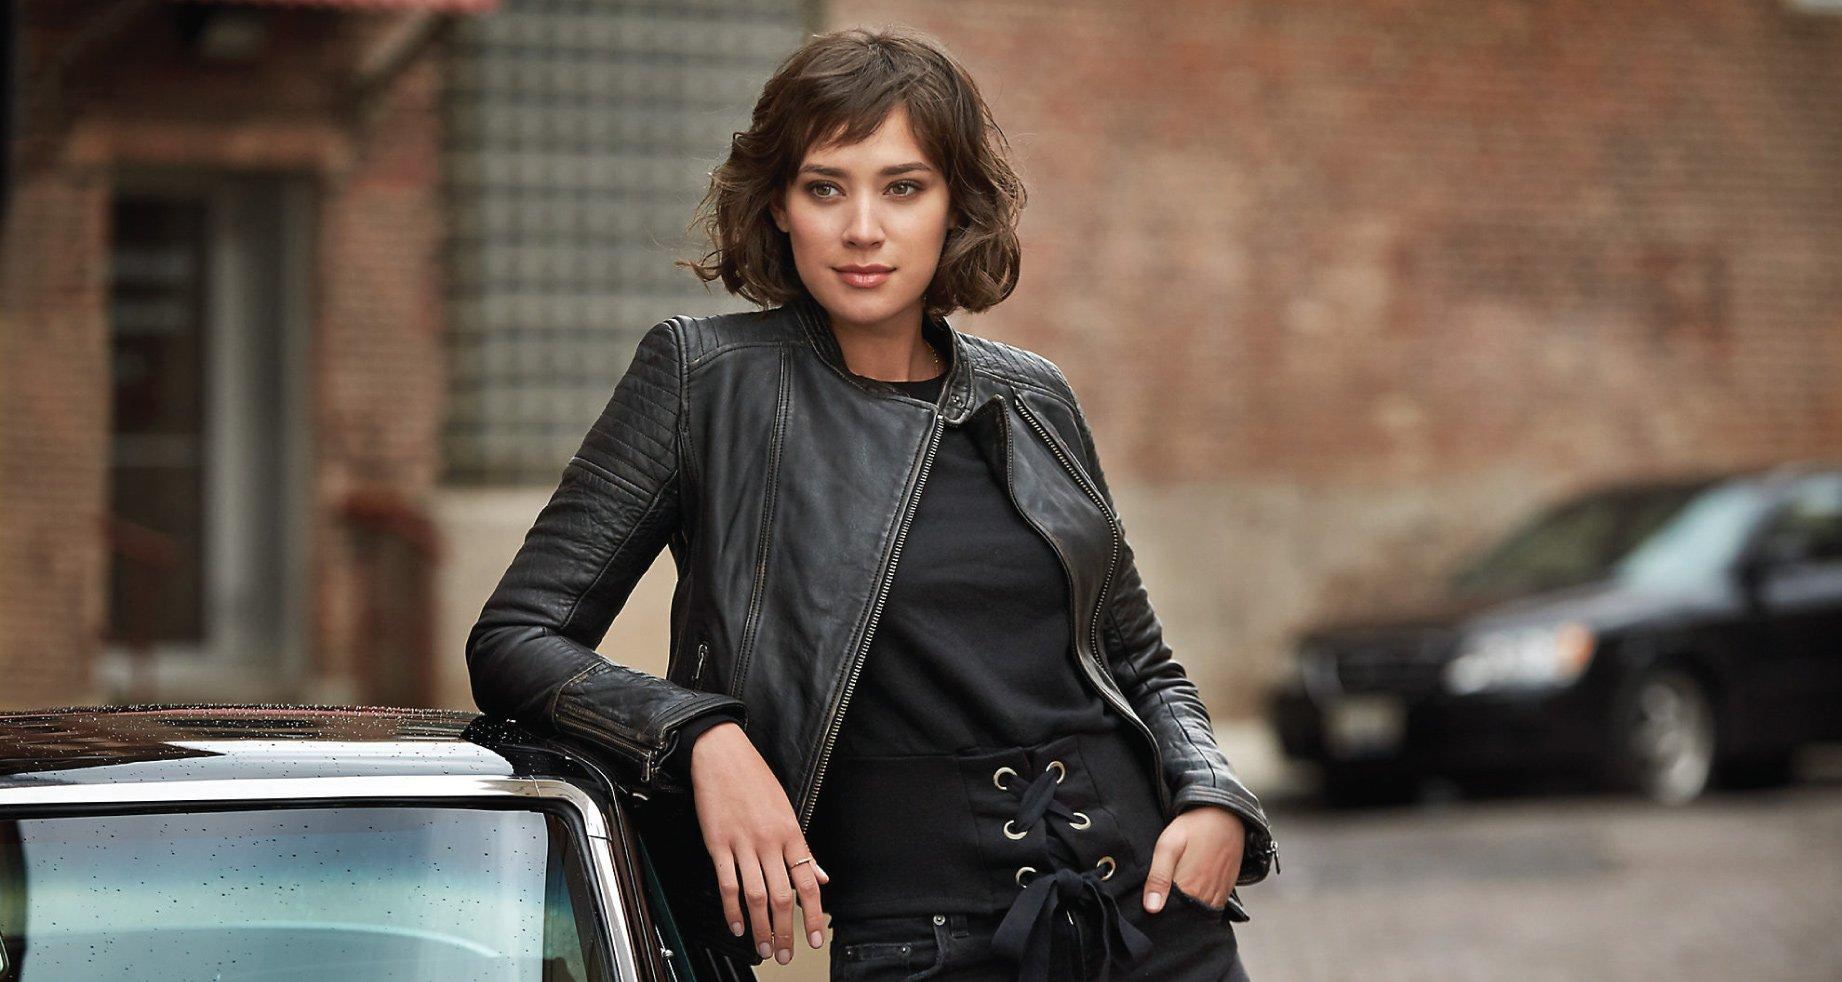 Shop Leather Coats & Jackets